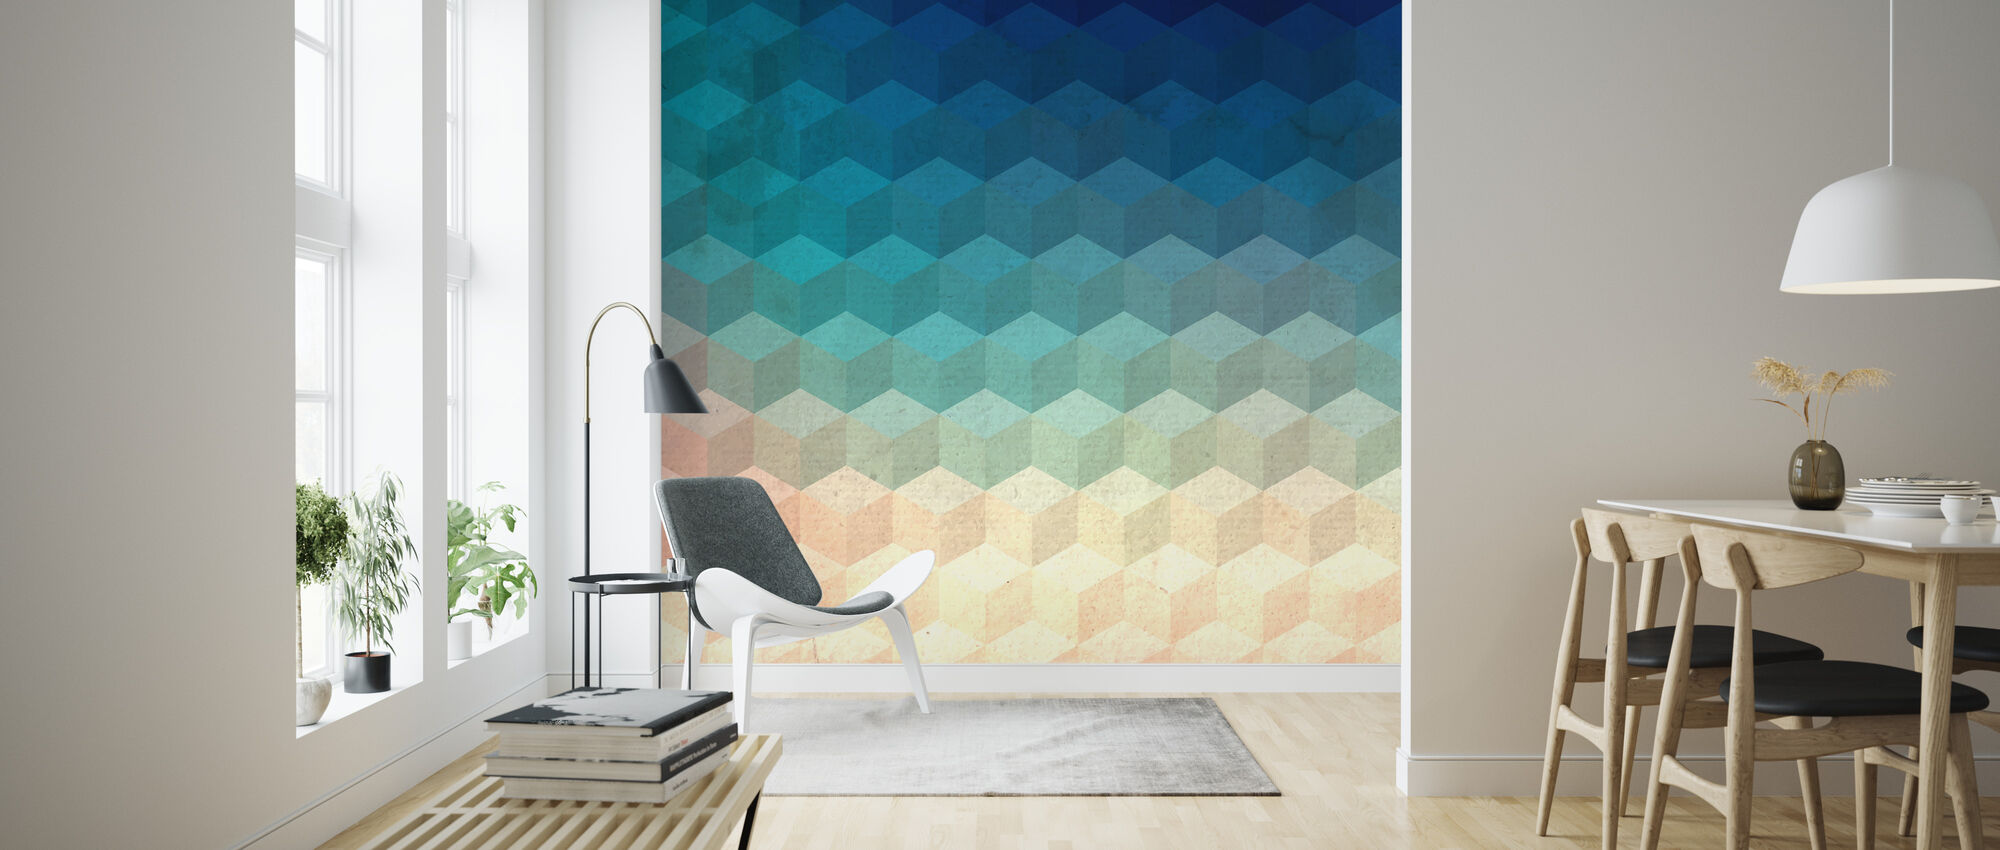 Hexagon Cubes - Wallpaper - Living Room